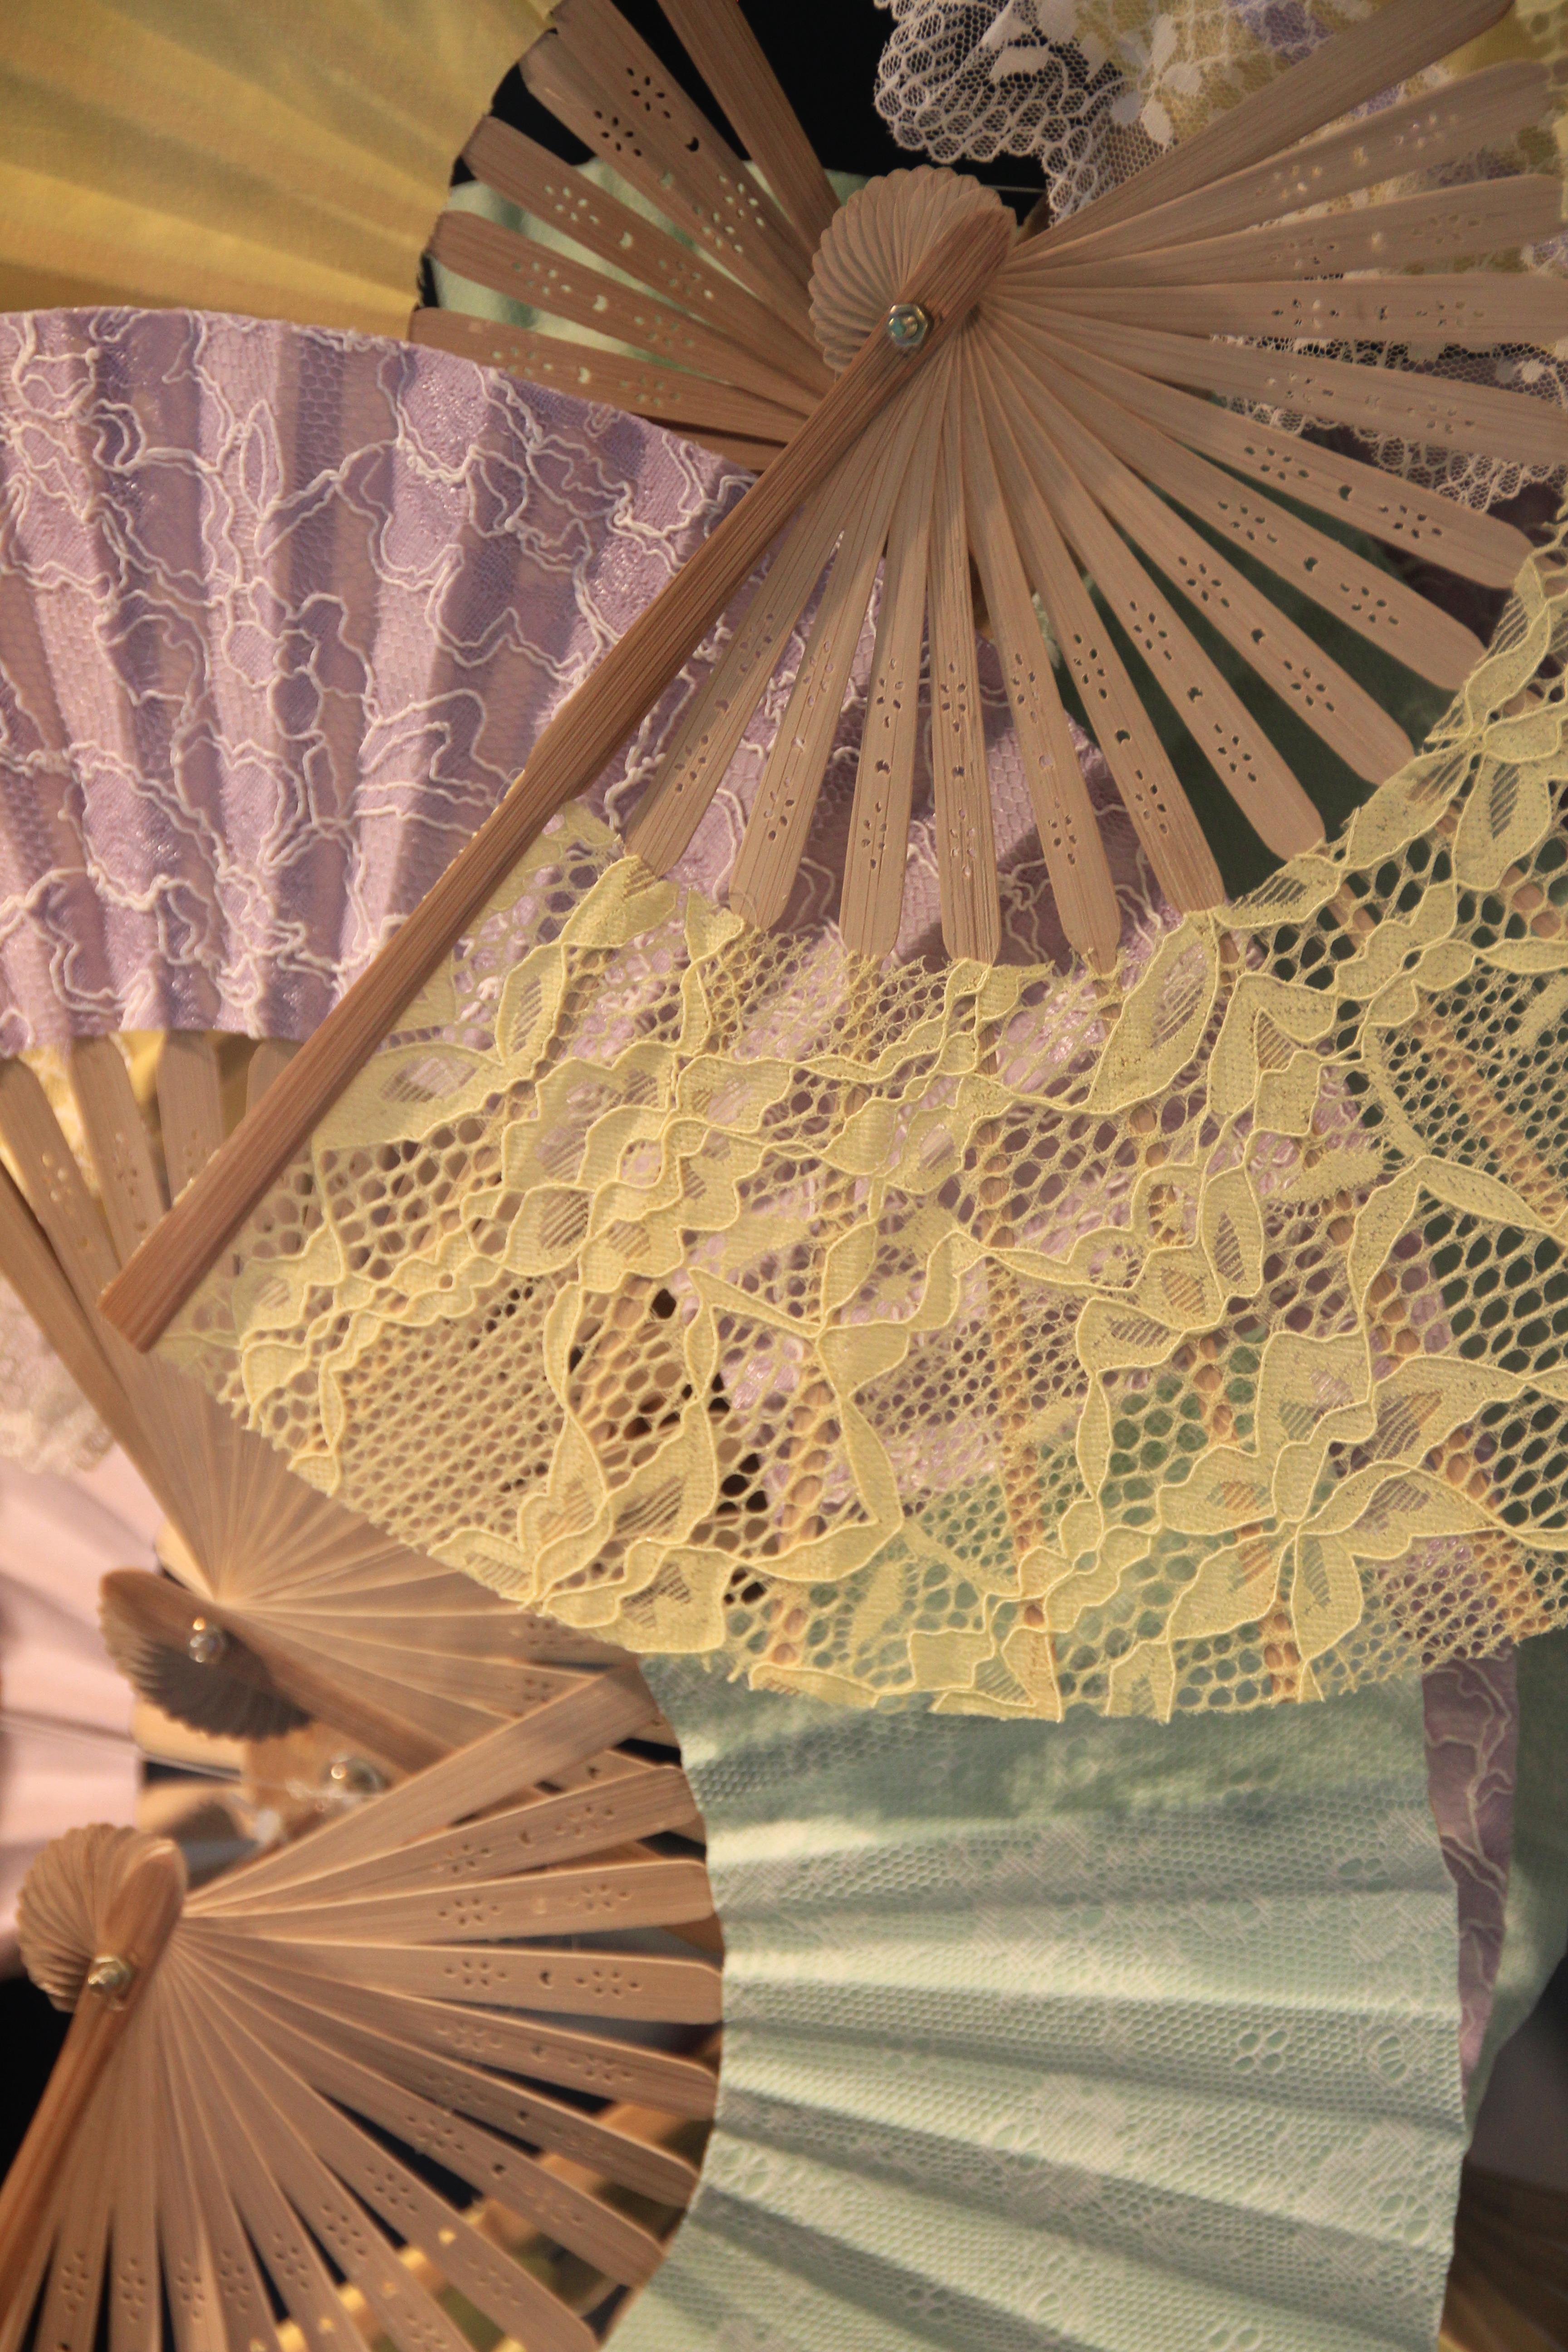 Free Images Flower Umbrella Asia Craft Art Dress Silk Gown